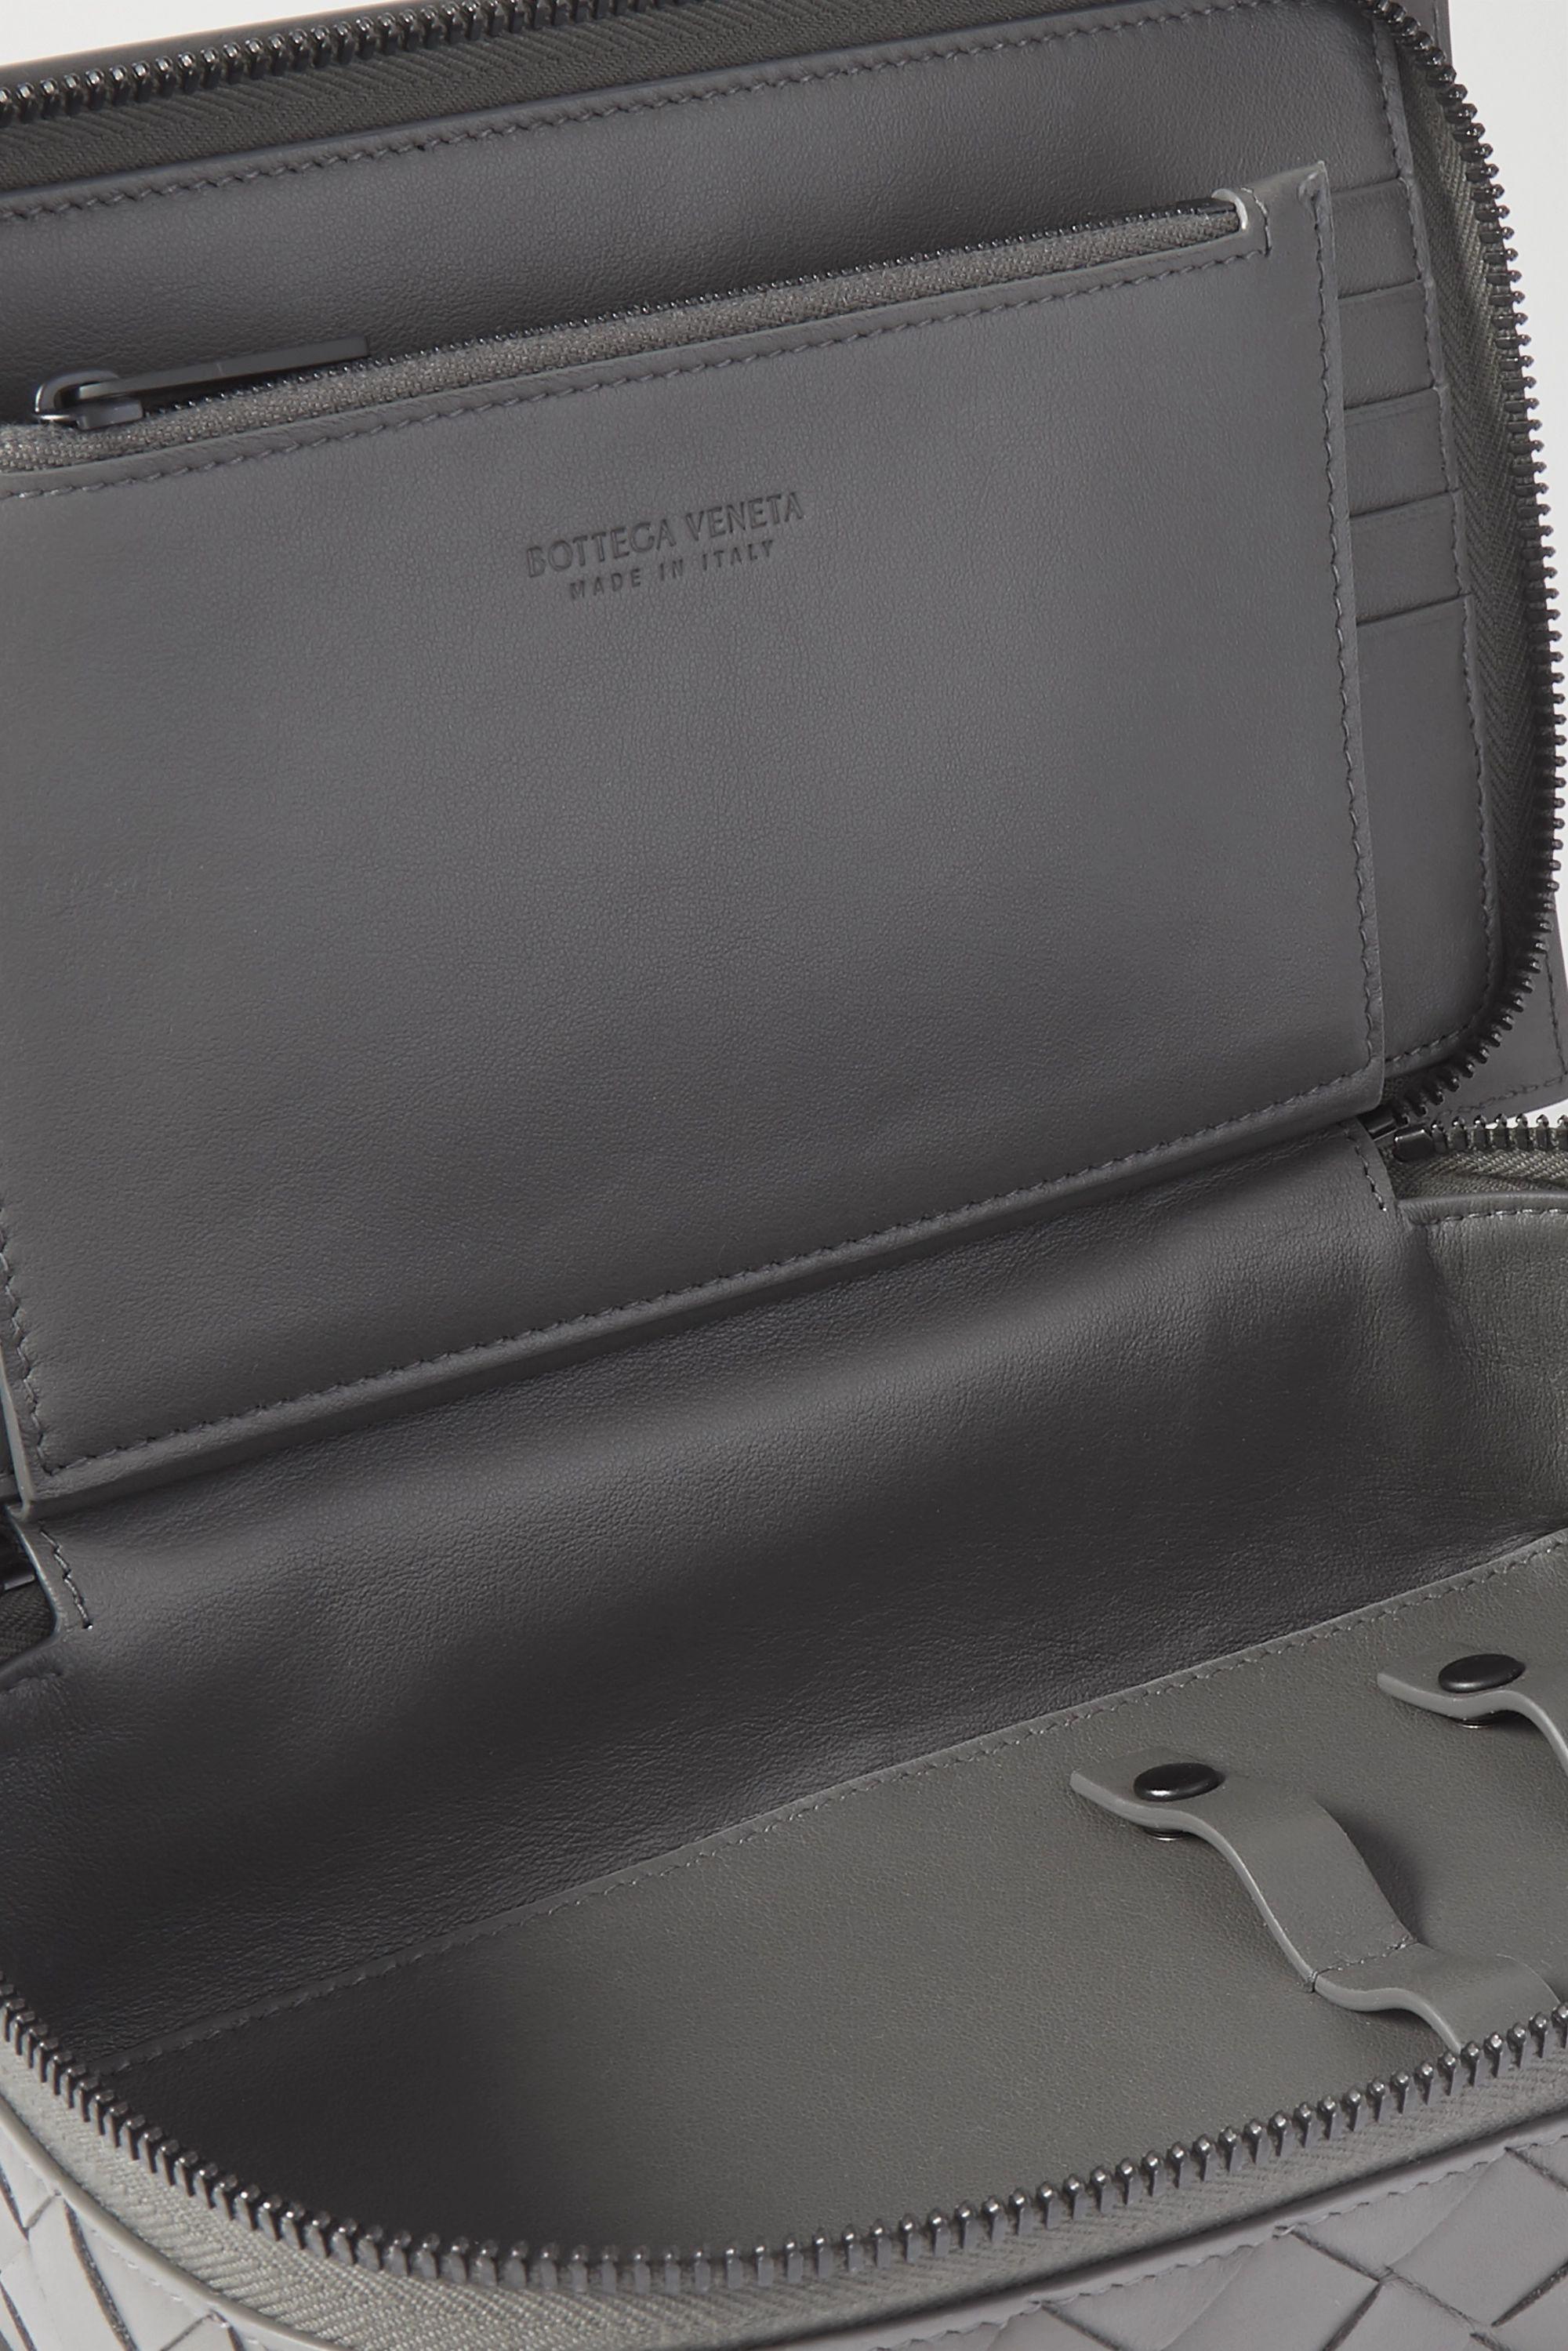 Bottega Veneta Intrecciato leather jewelry case